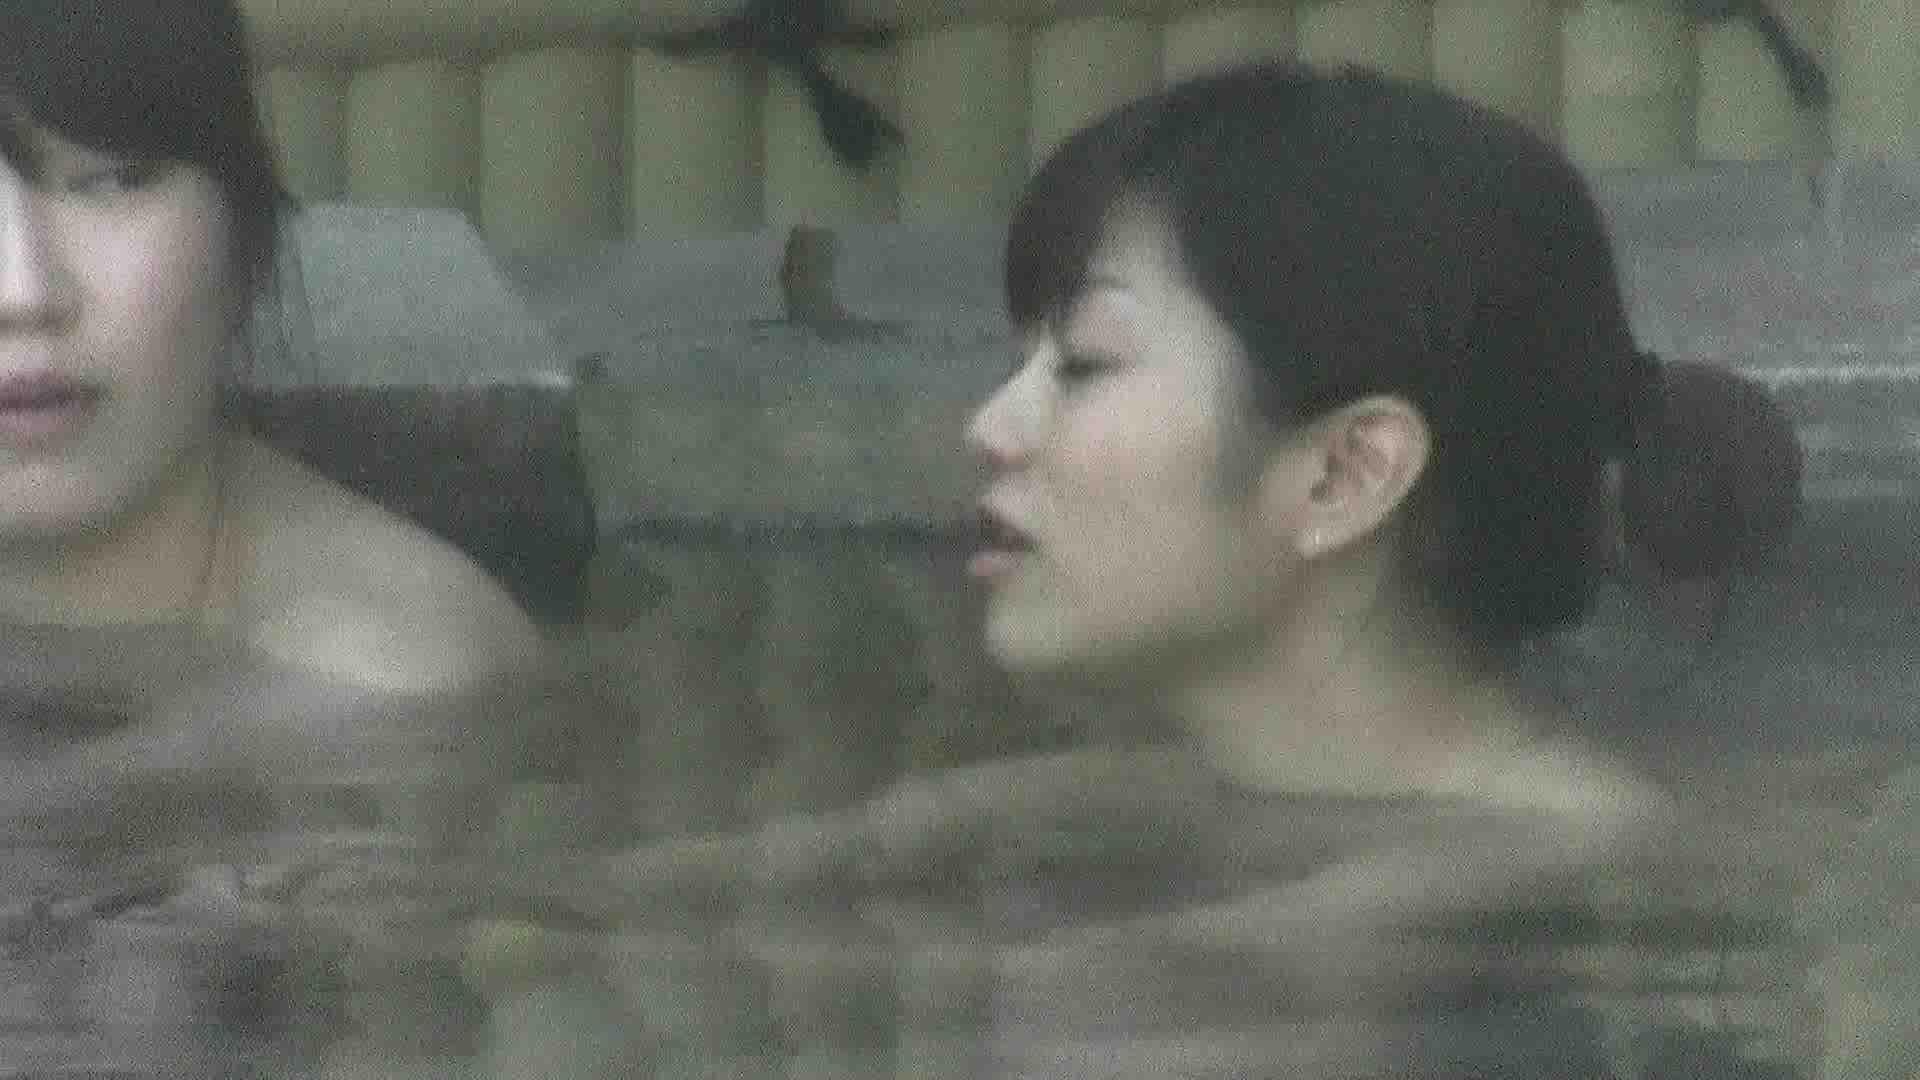 Aquaな露天風呂Vol.206 0  59連発 12